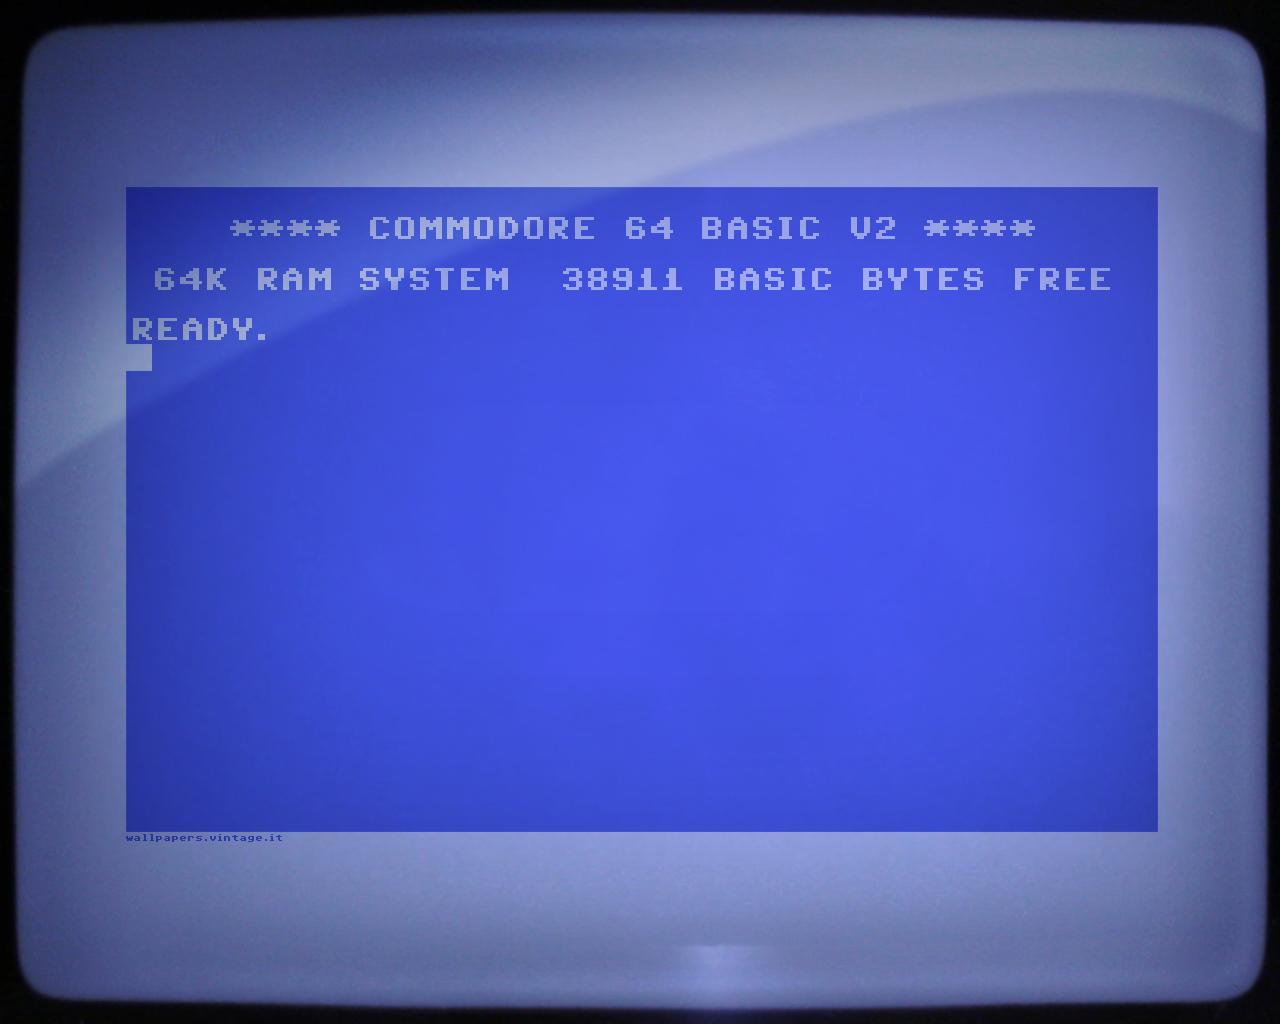 Best 56 Commodore 64 Wallpaper on HipWallpaper Donkey Kong 64 1280x1024